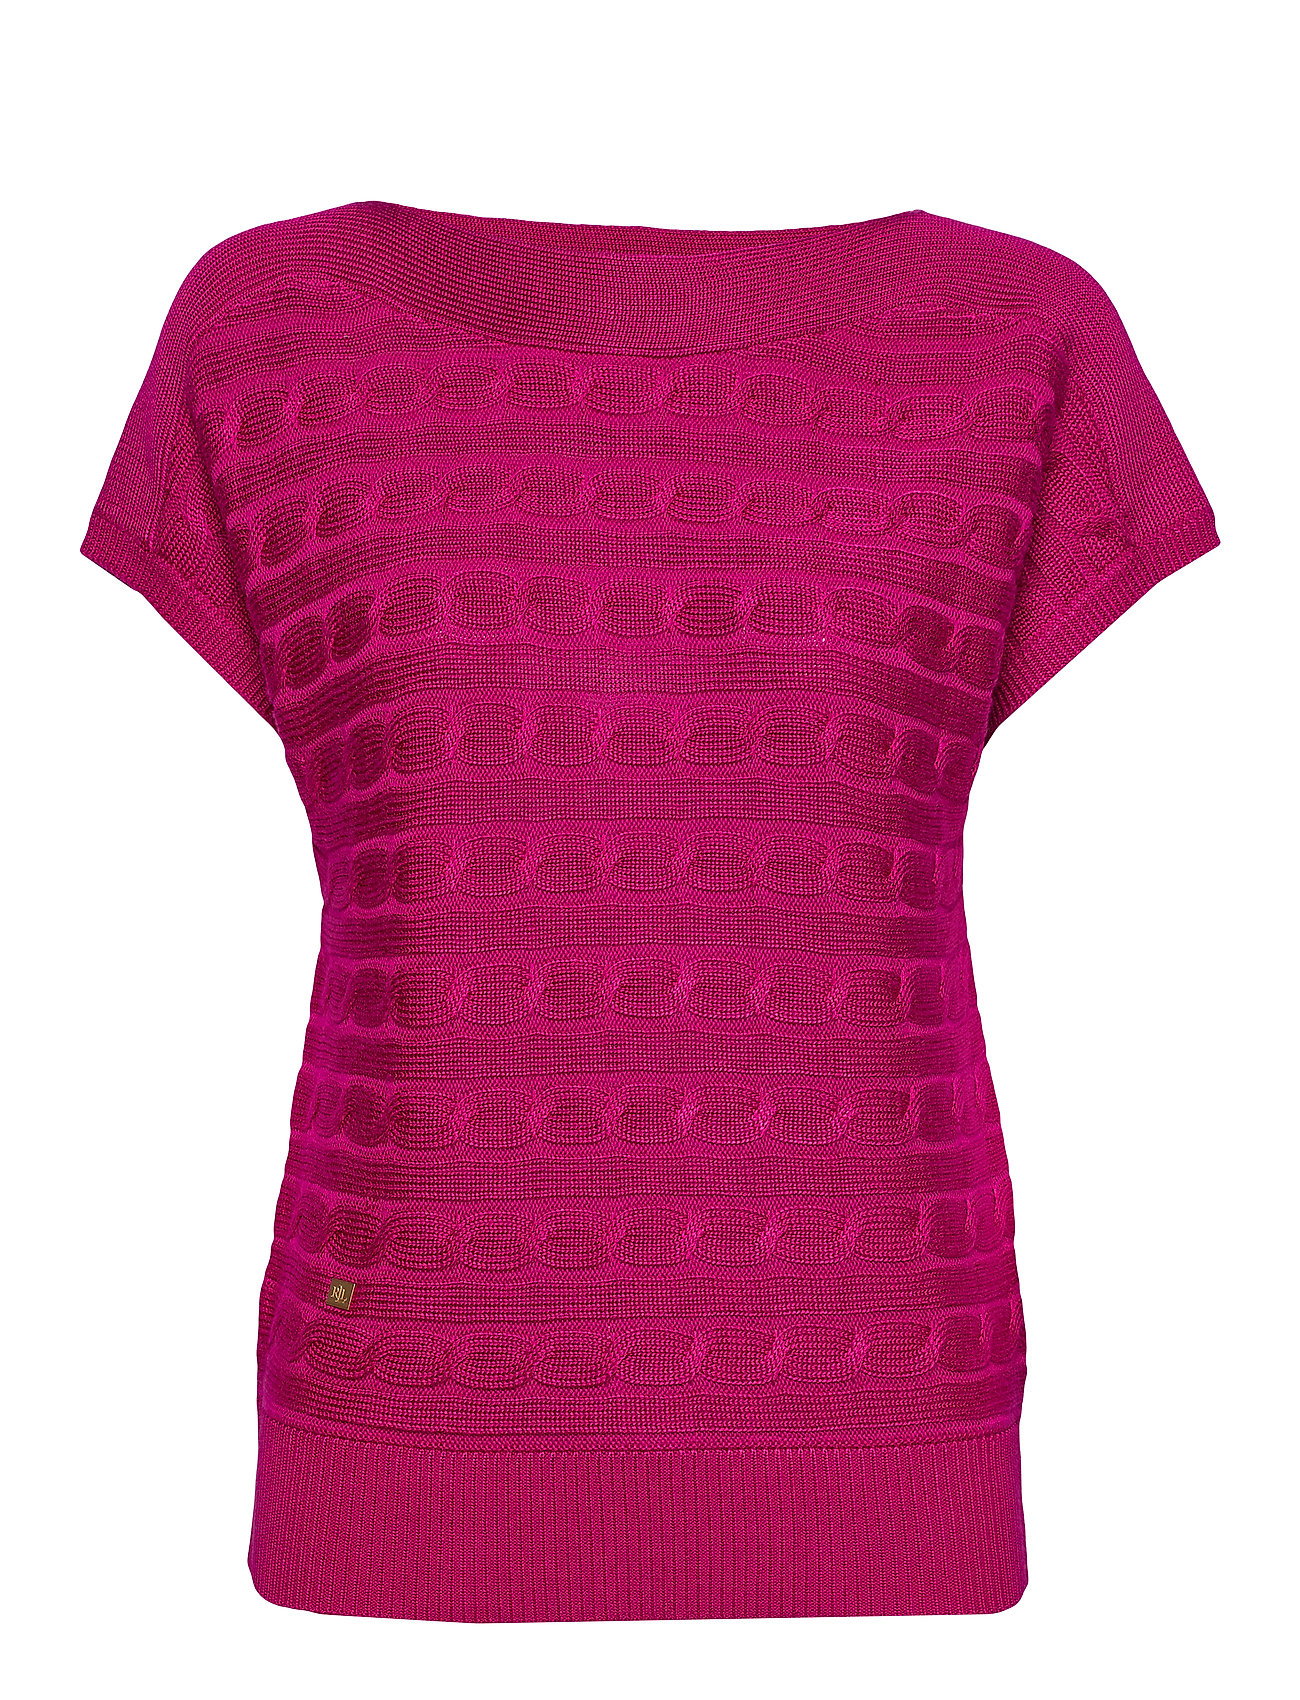 Lauren Ralph Lauren Cable-Knit Boatneck Sweater - BRIGHT FUCHSIA